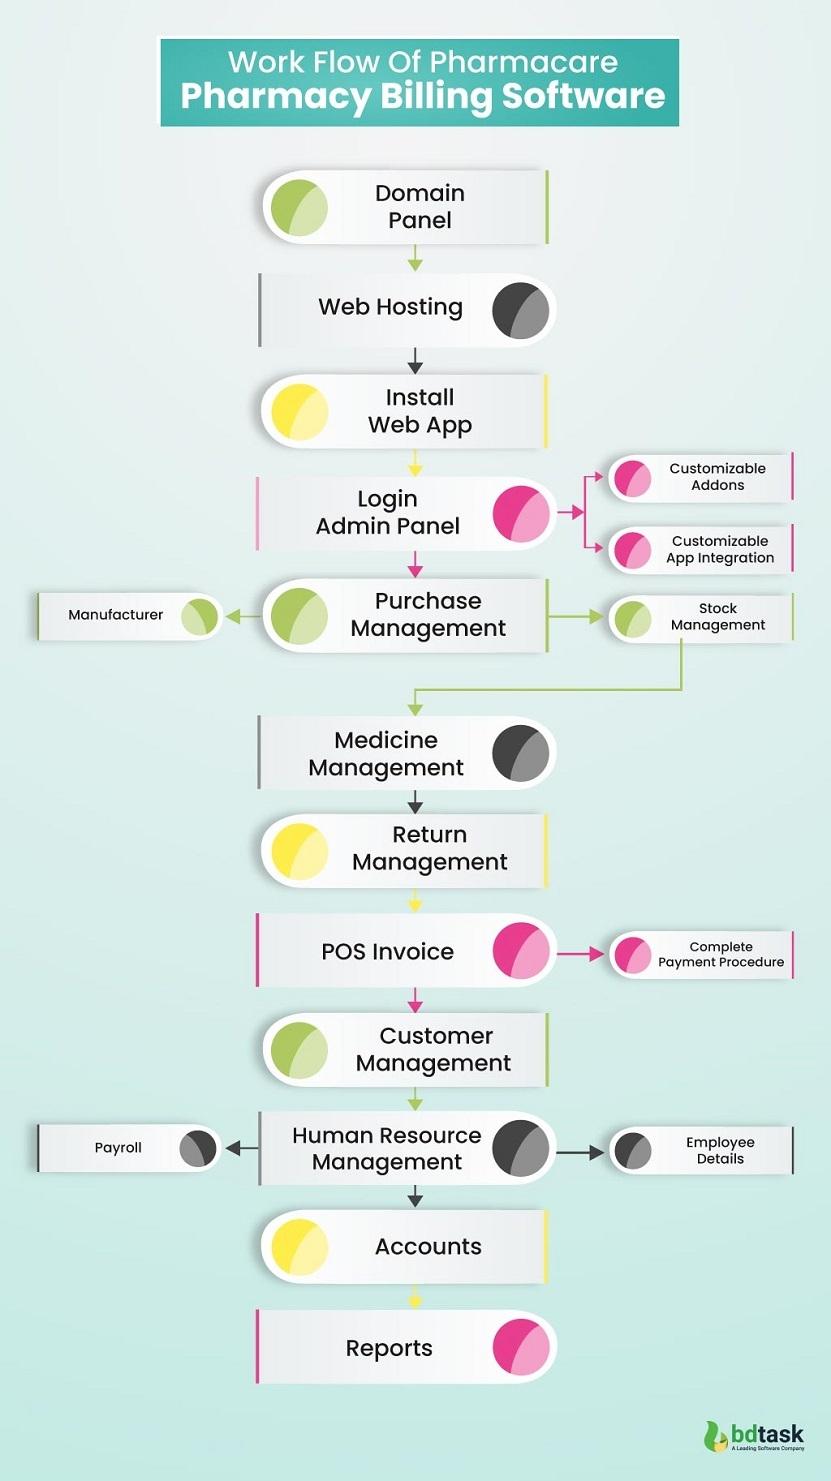 Work Flow of Pharmacy Billing Software